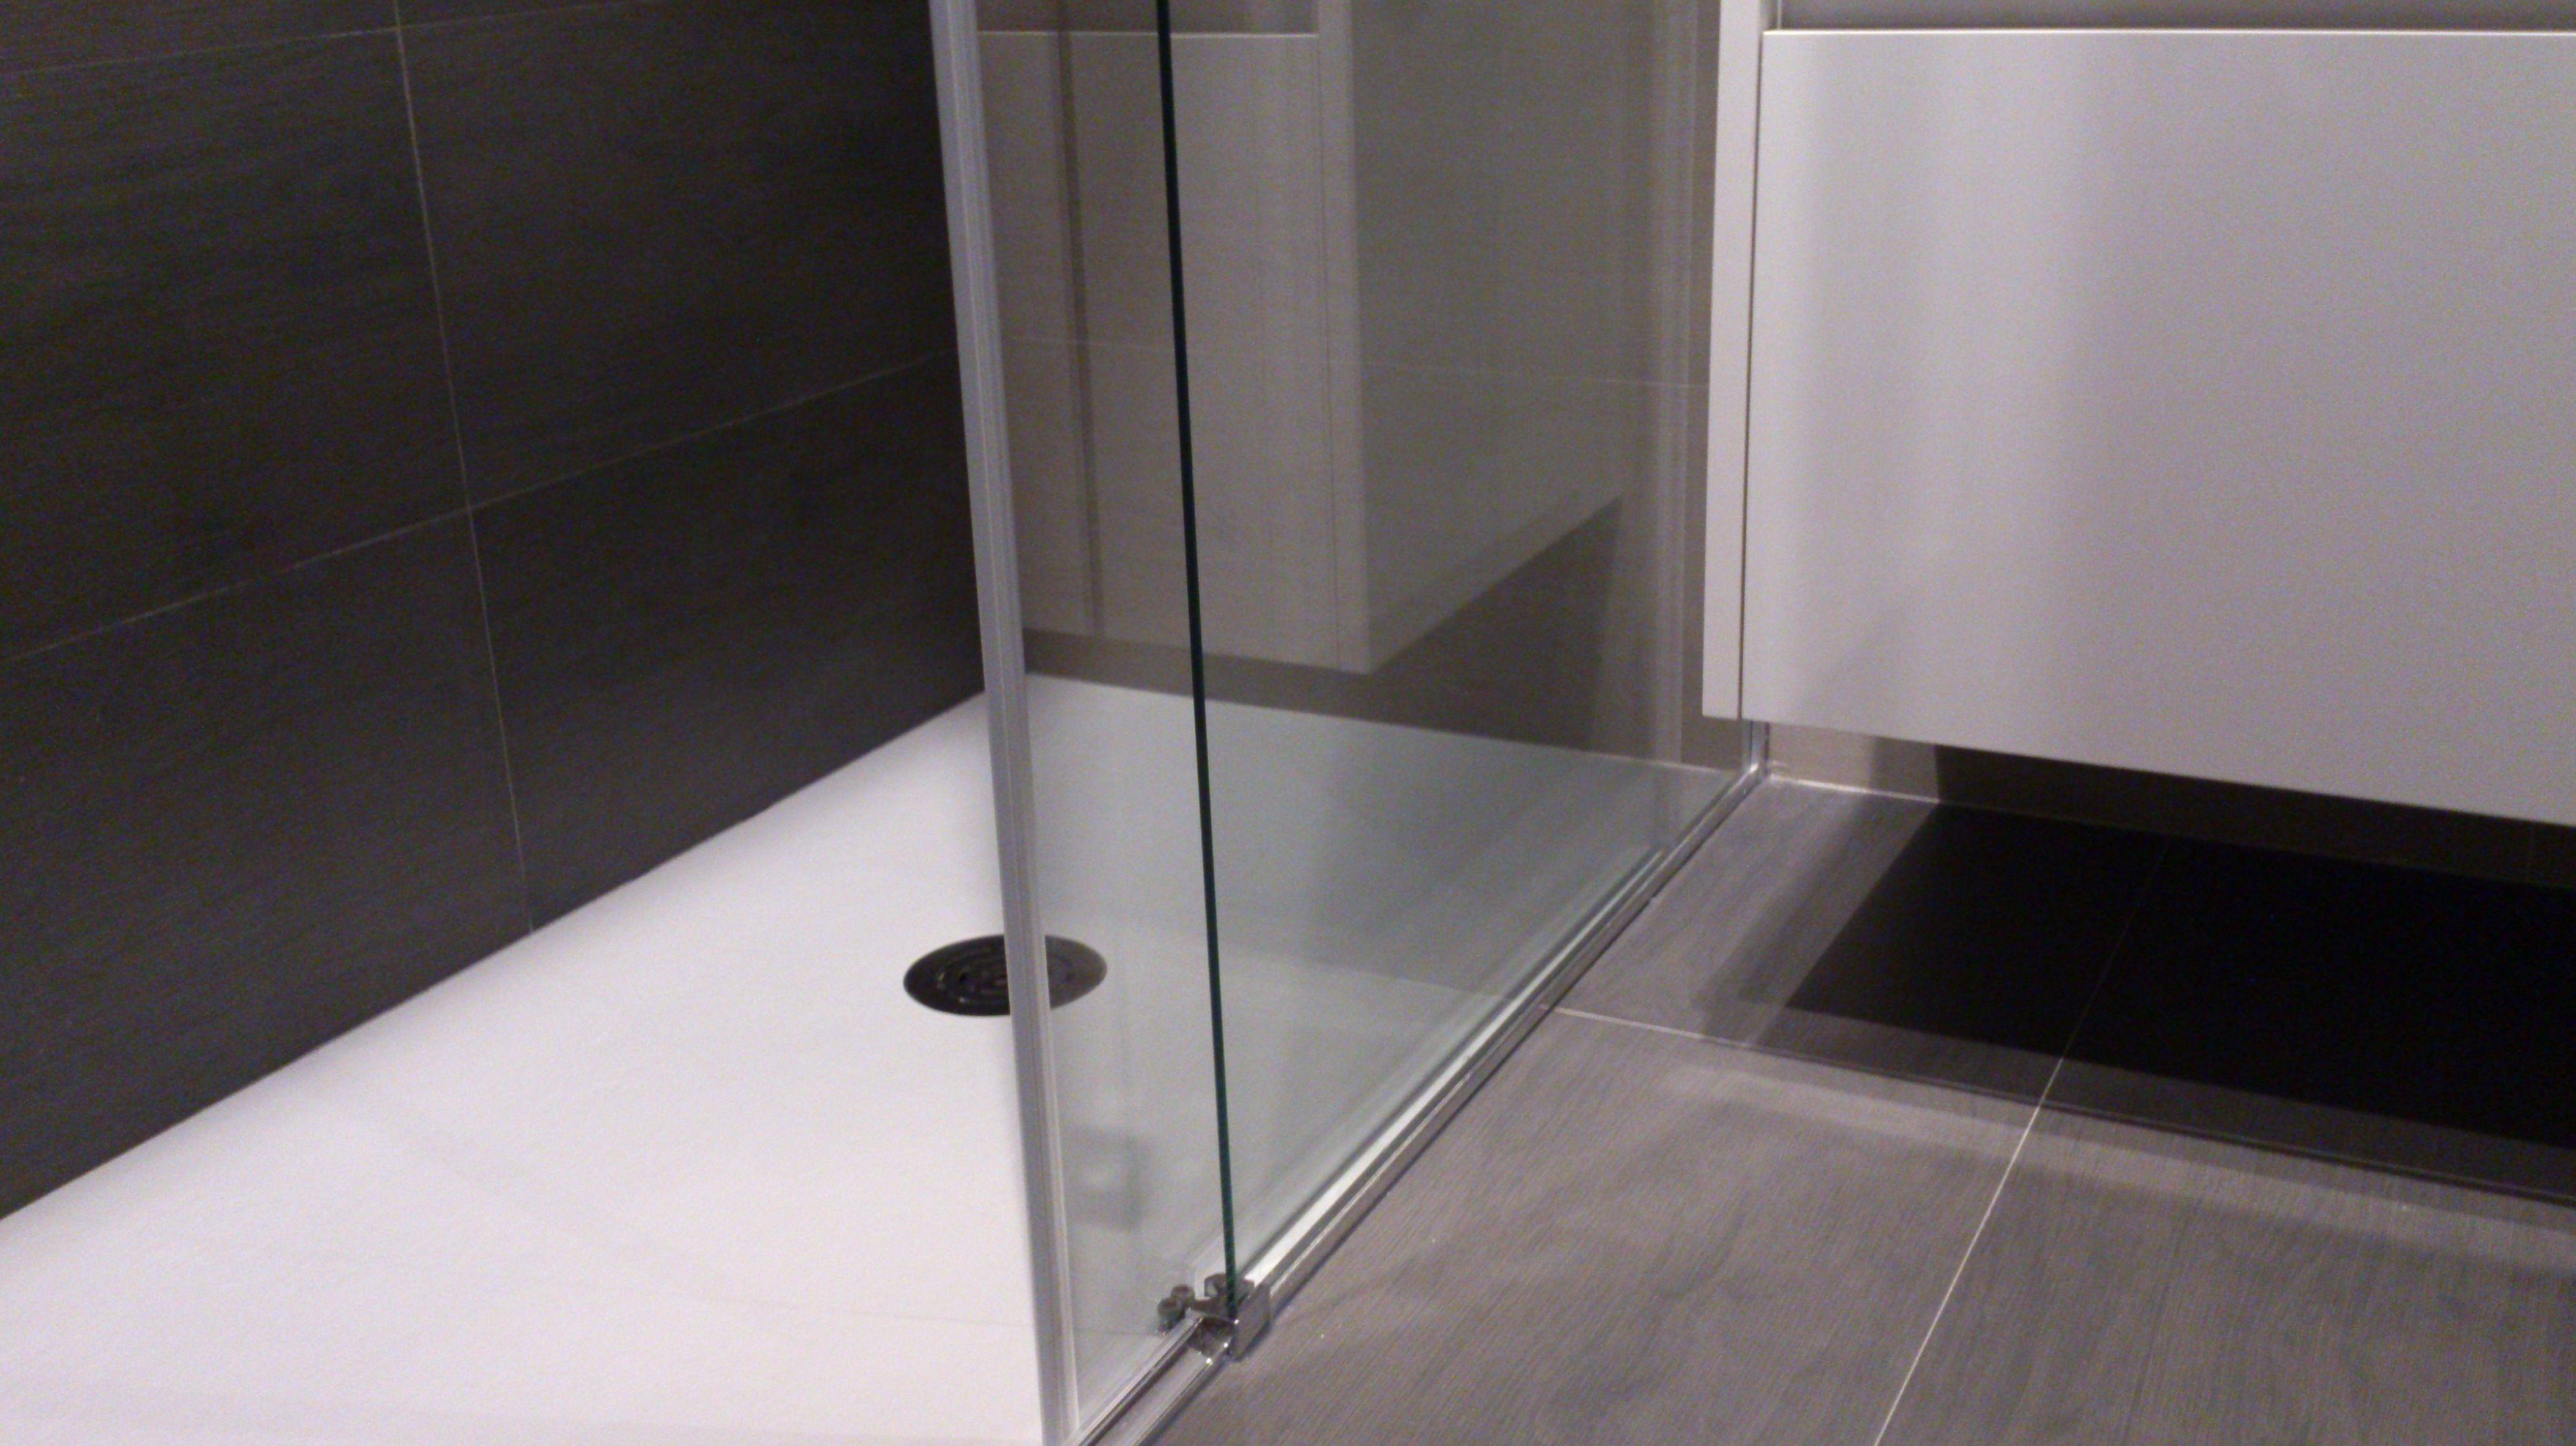 cambio de bañera por plato ducha vitoria